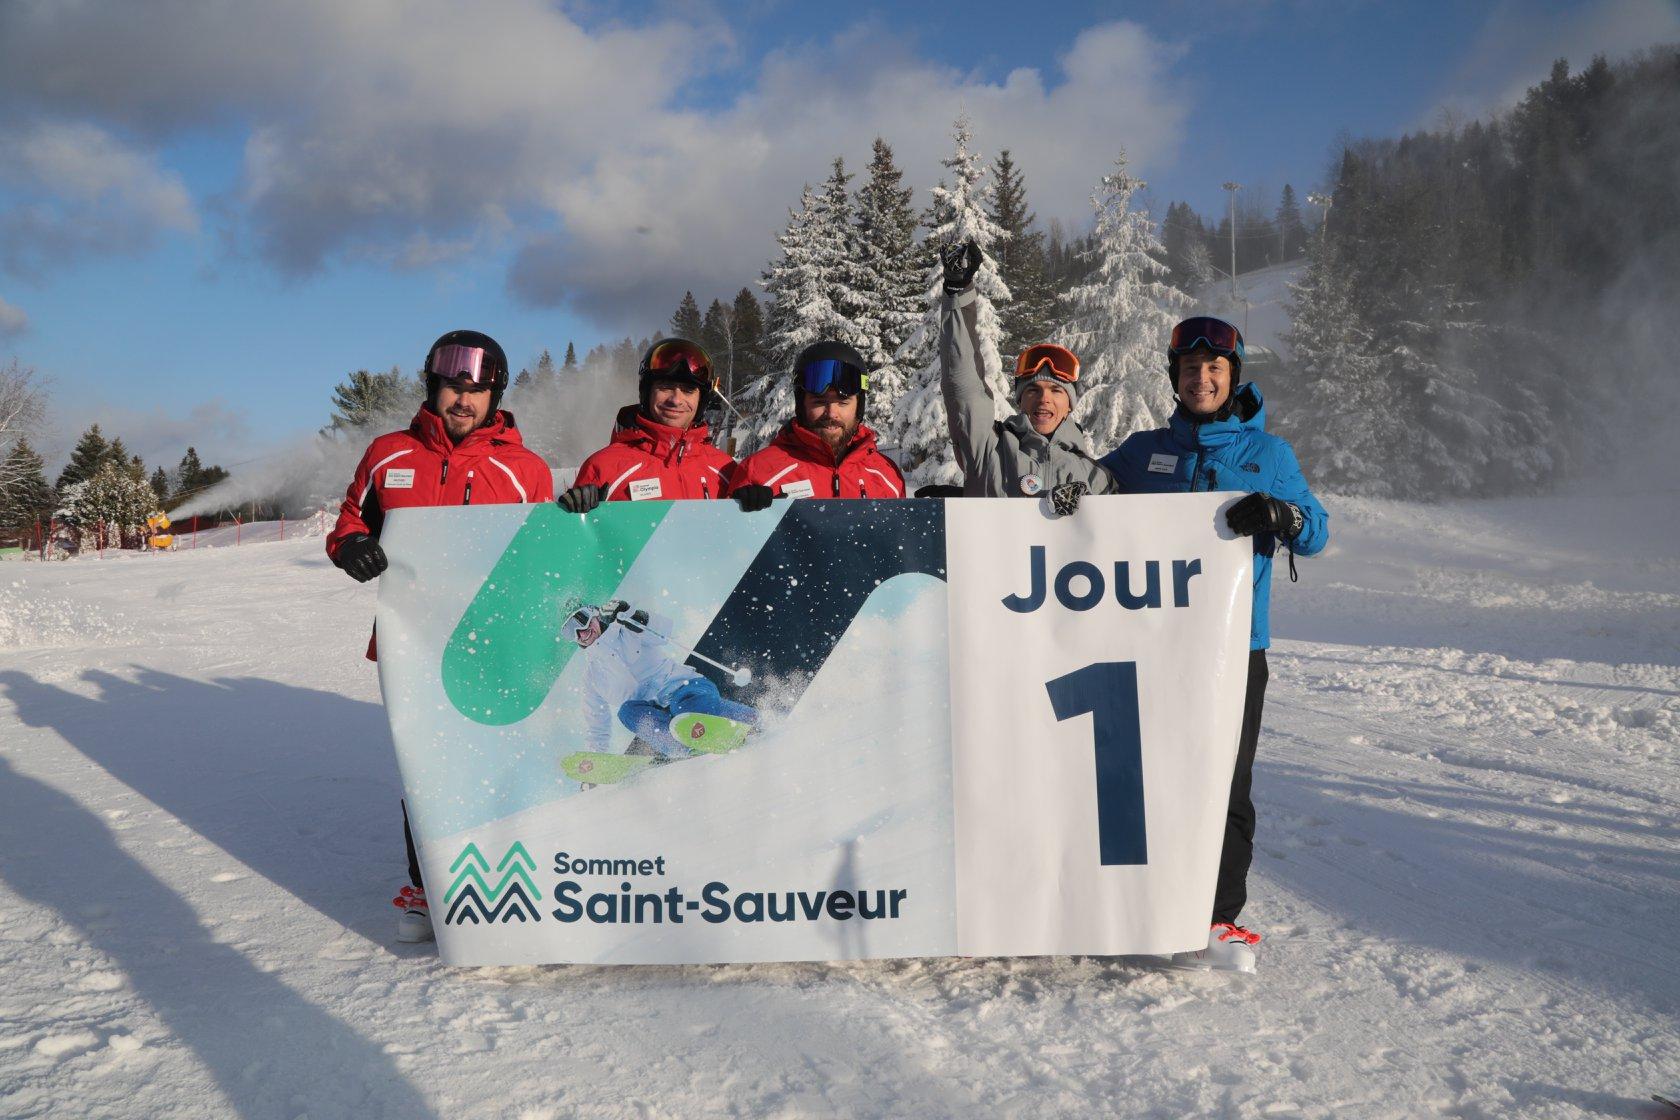 Start of the season, Mont Saint Sauveur